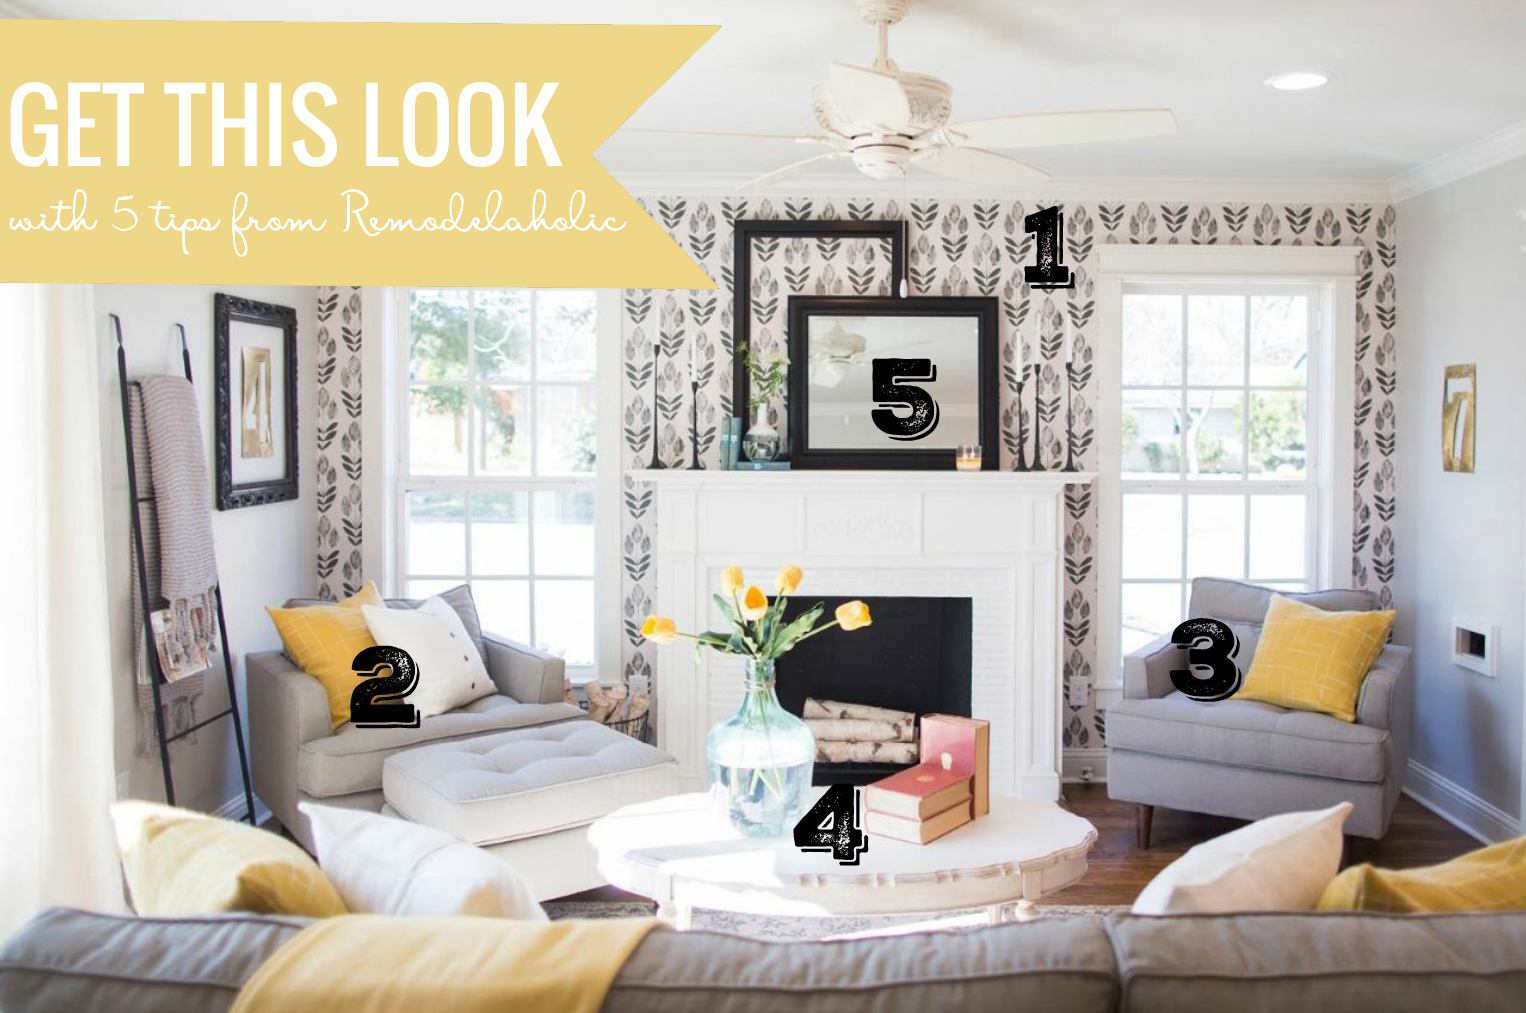 Get this Look - Fixer Upper Living Room Chicken House